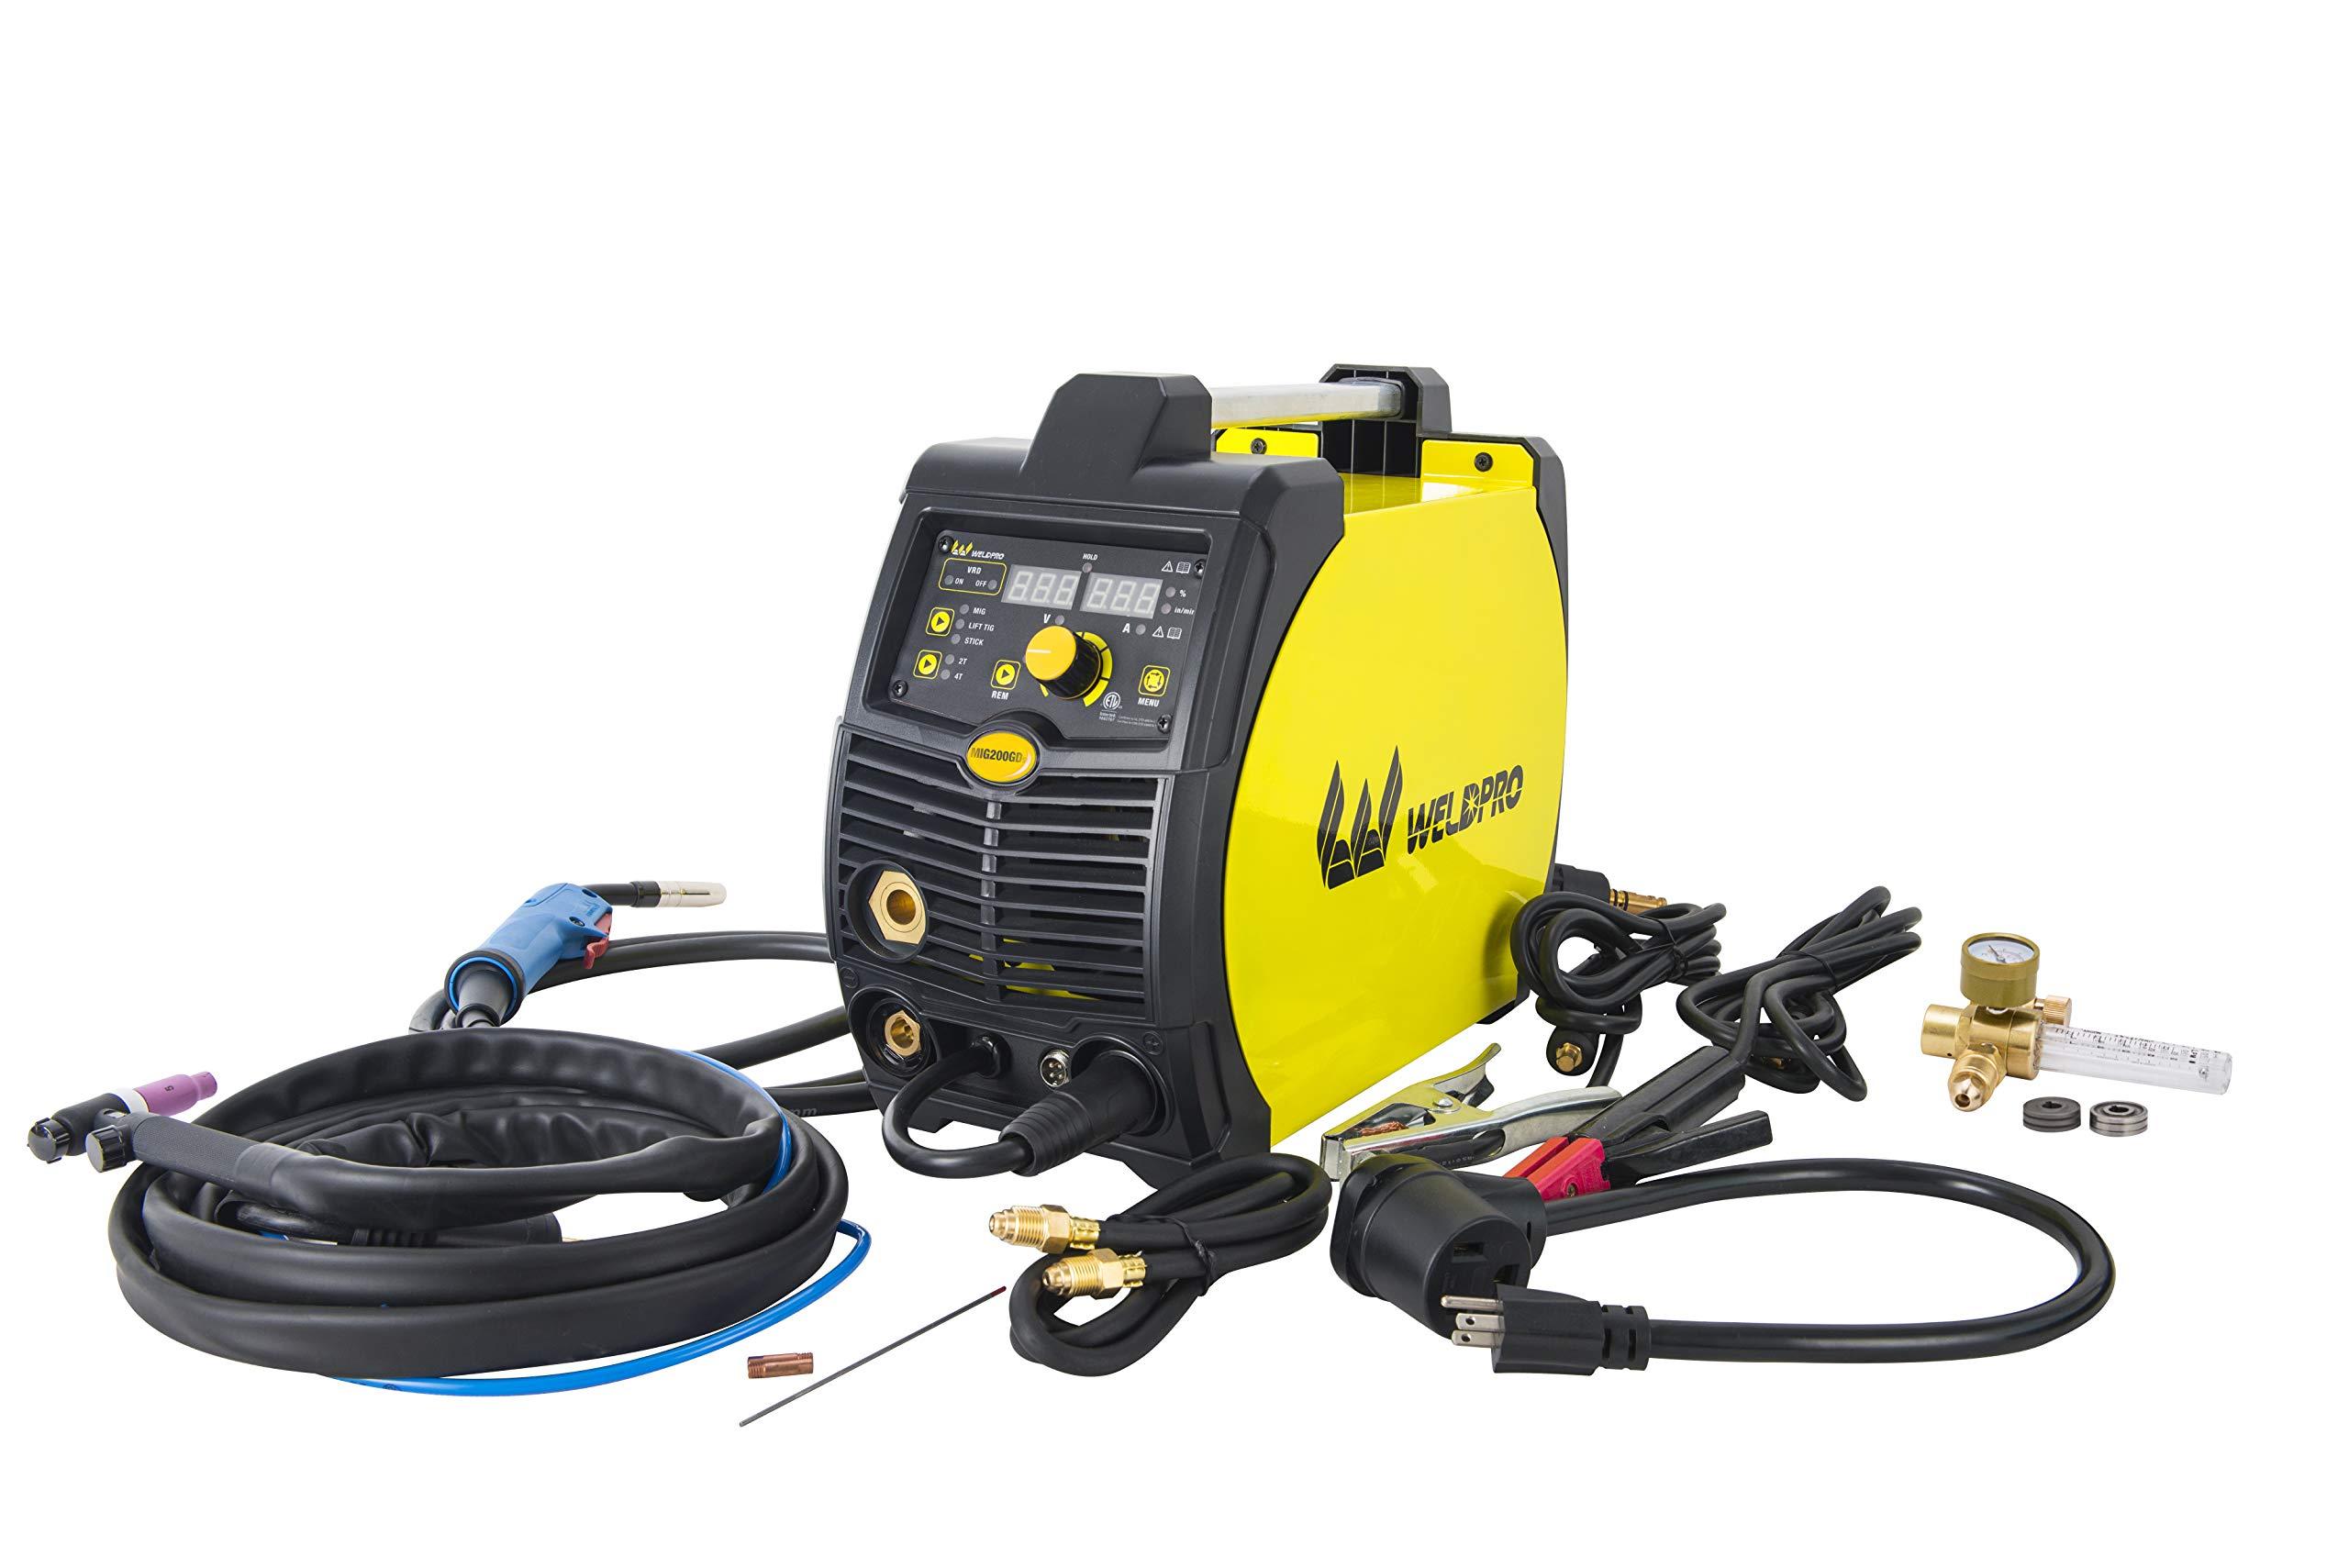 Weldpro 200 Amp Inverter Multi Process Welder with Dual Voltage 220V/110V Mig/Tig/Arc Stick 3 1 welder/welding machine by W Weldpro